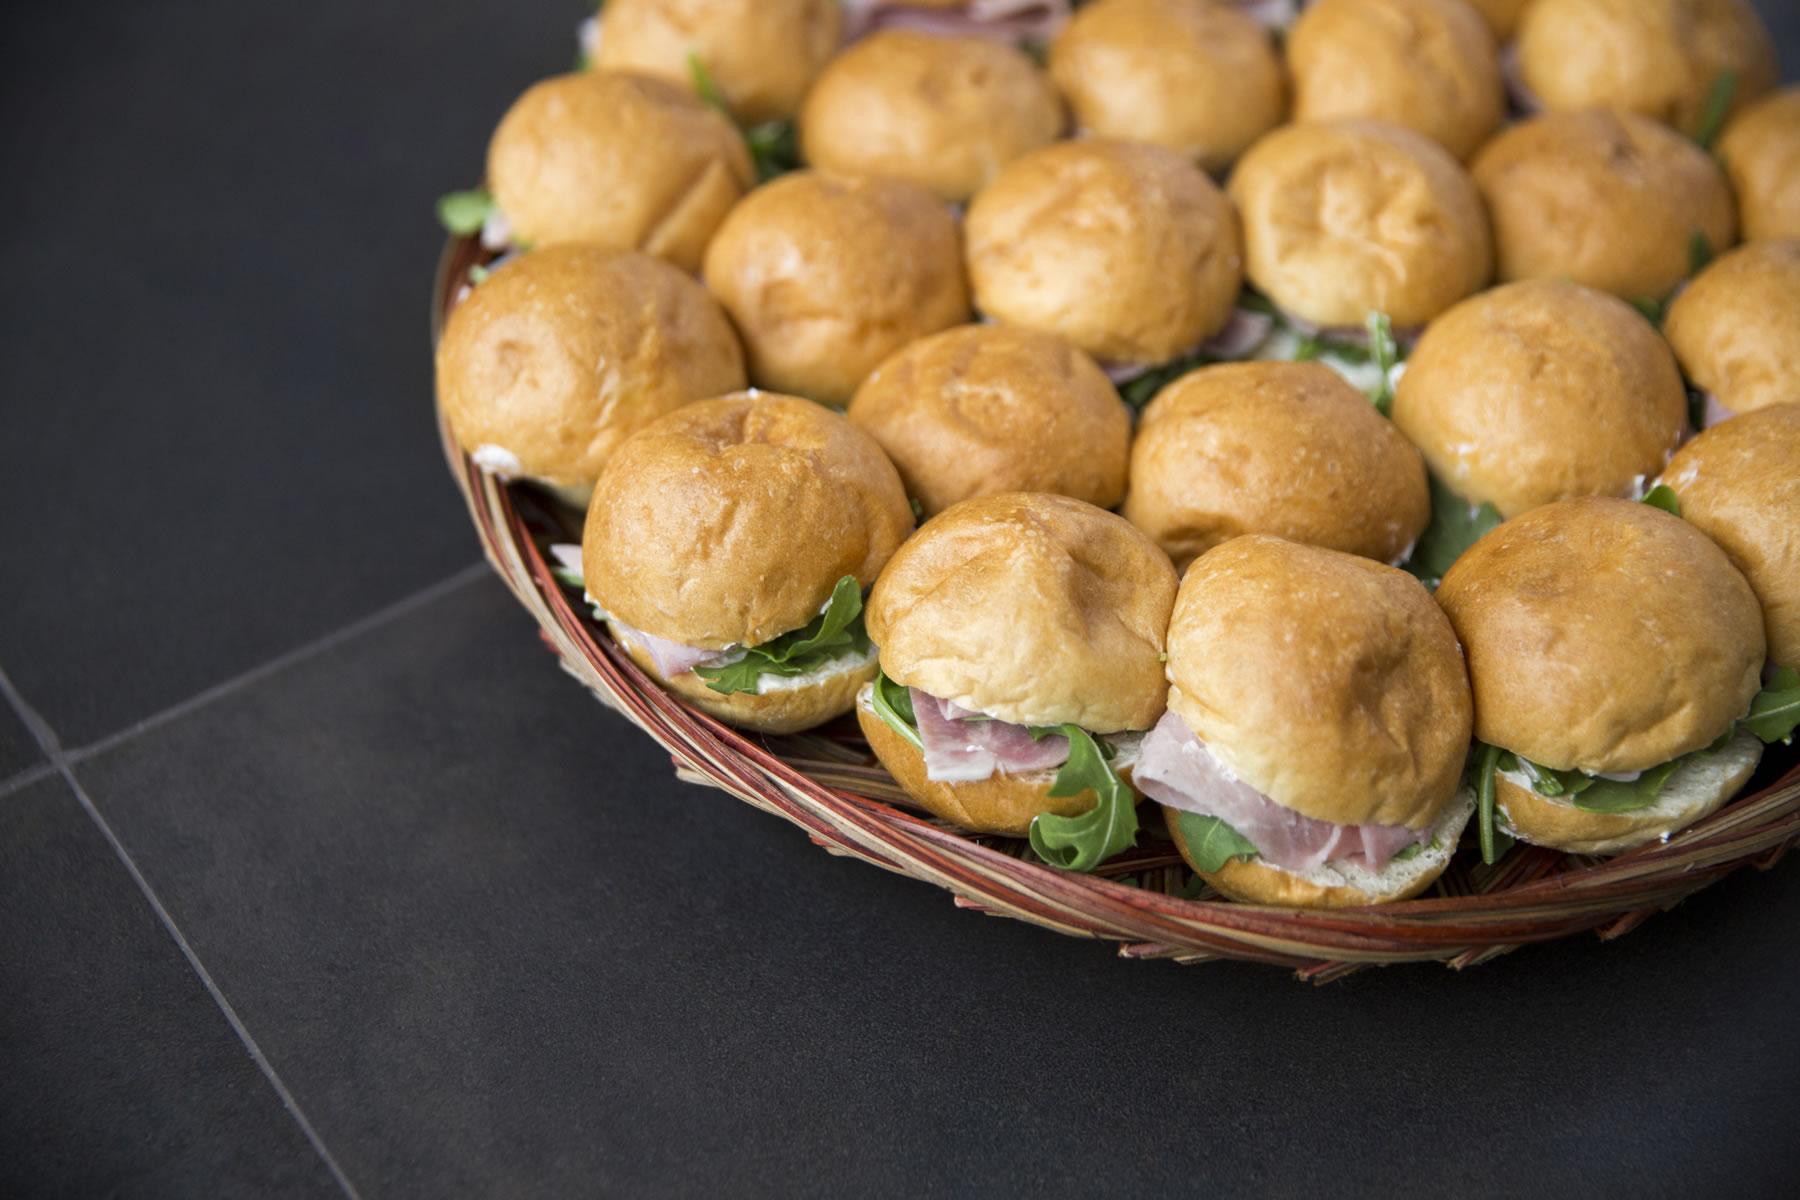 Sandwich Platters Market Hall Caterers